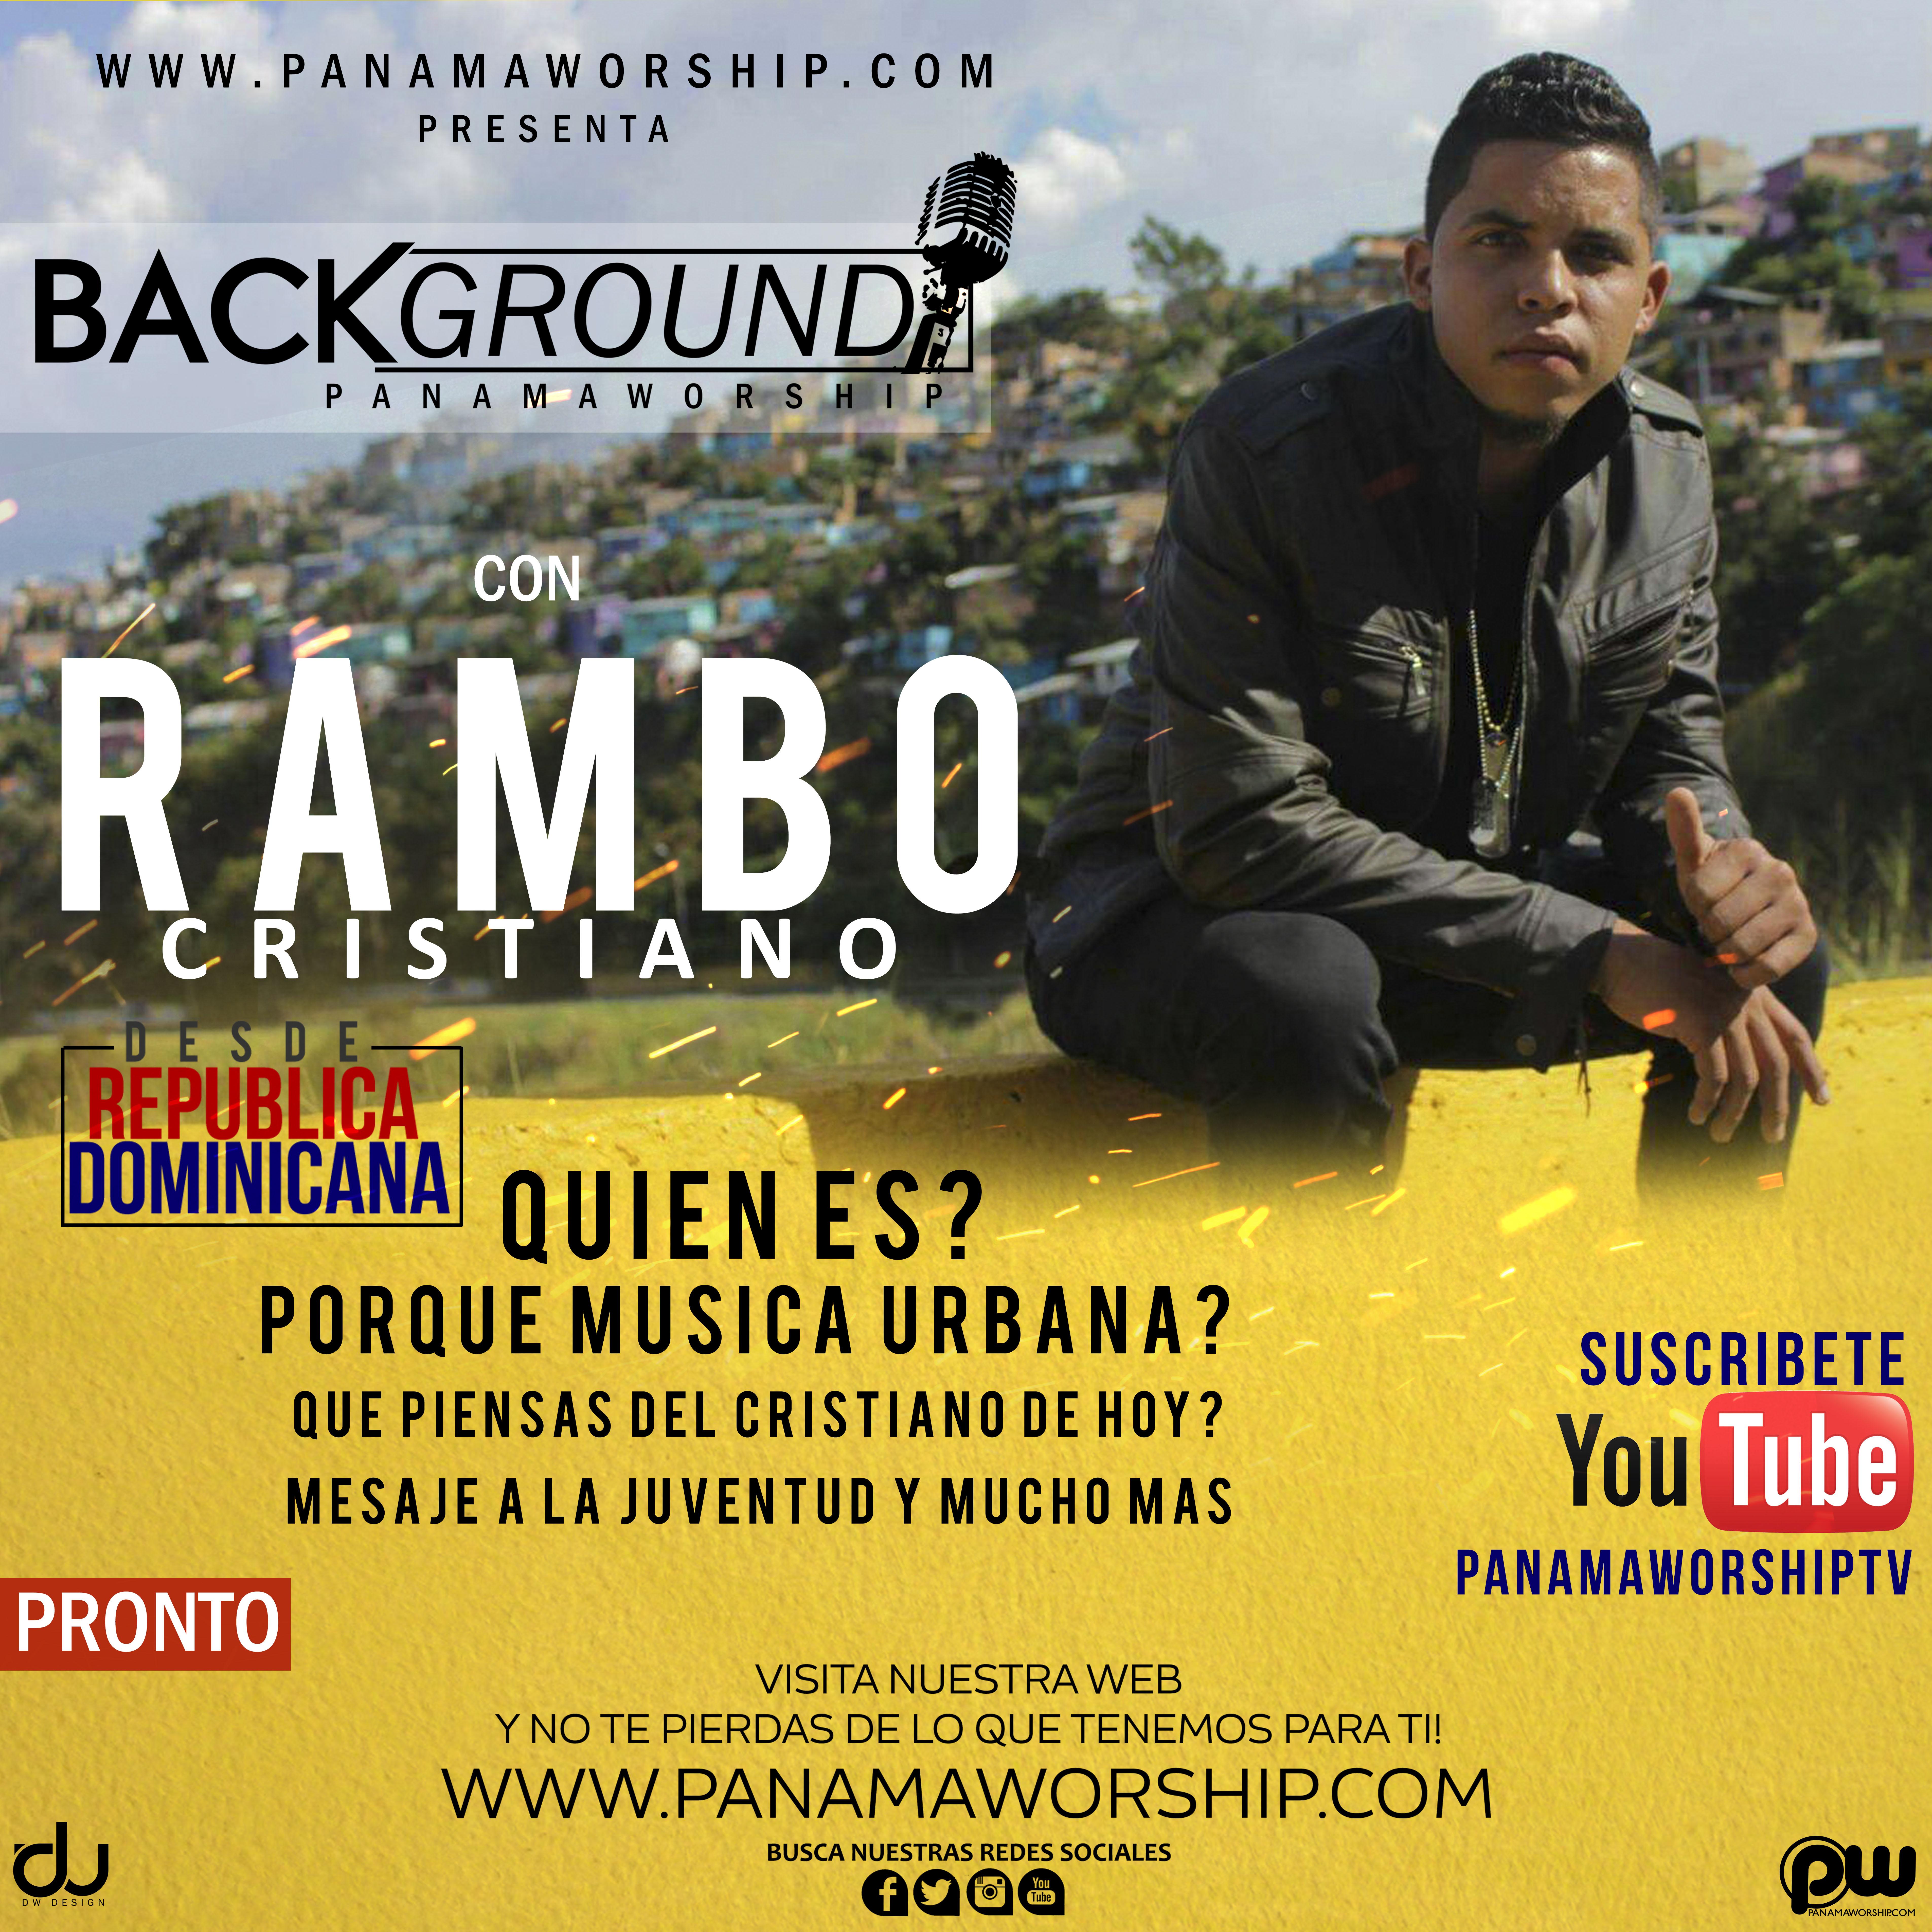 background-2-rambo